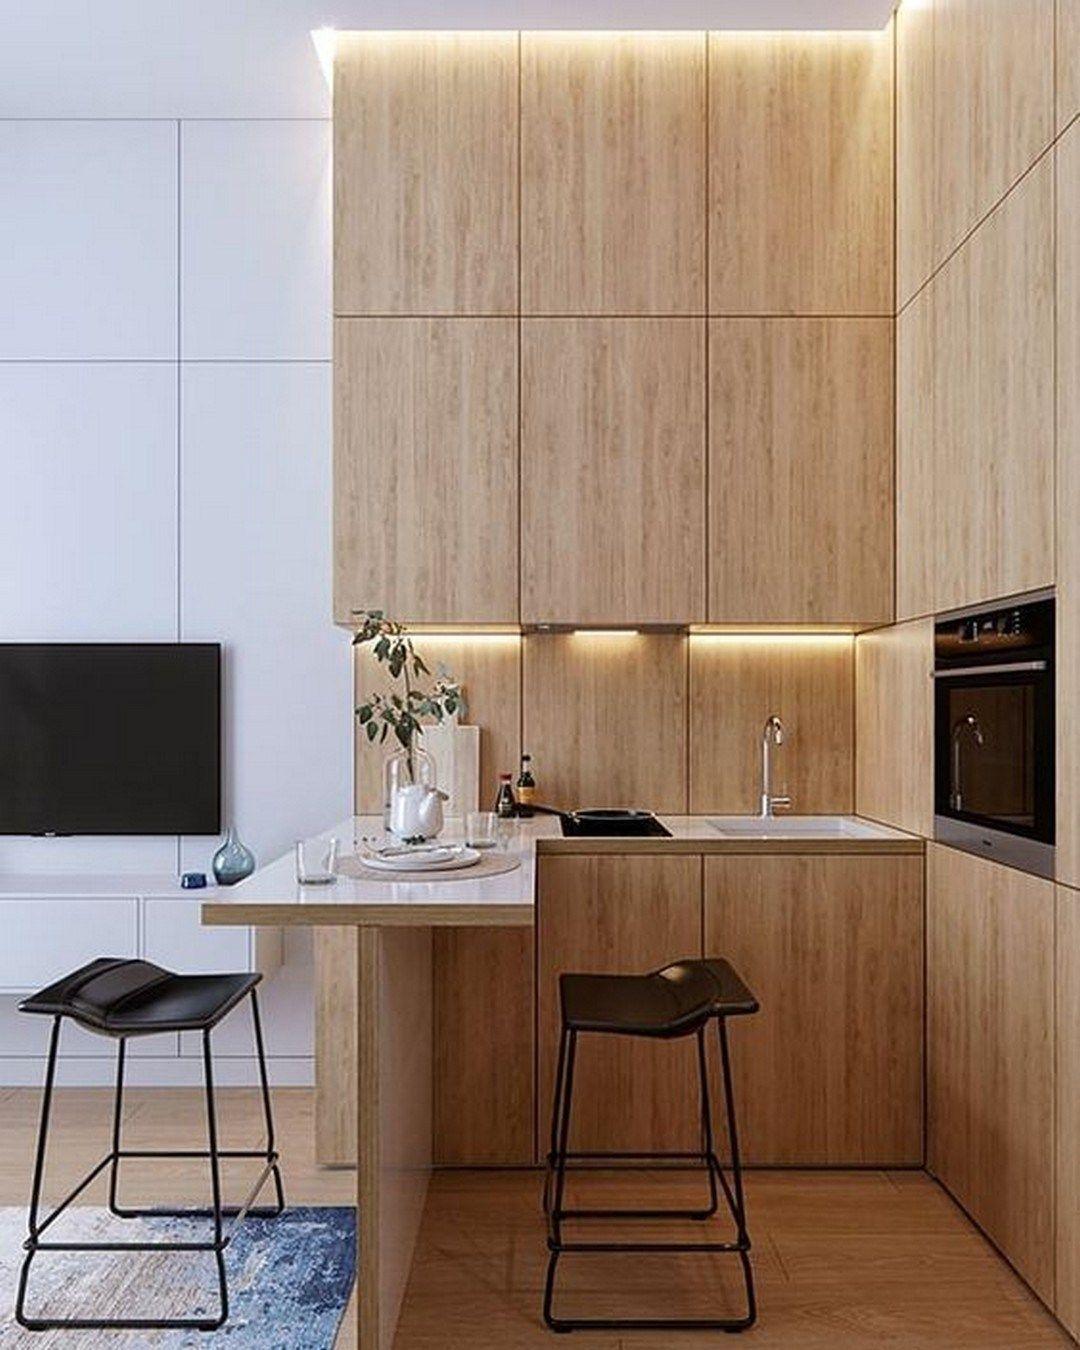 40 Exciting Small Modern Kitchen Design Ideas 22 In 2020 Small Modern Kitchens Minimalist Kitchen Design Small Kitchen Decor